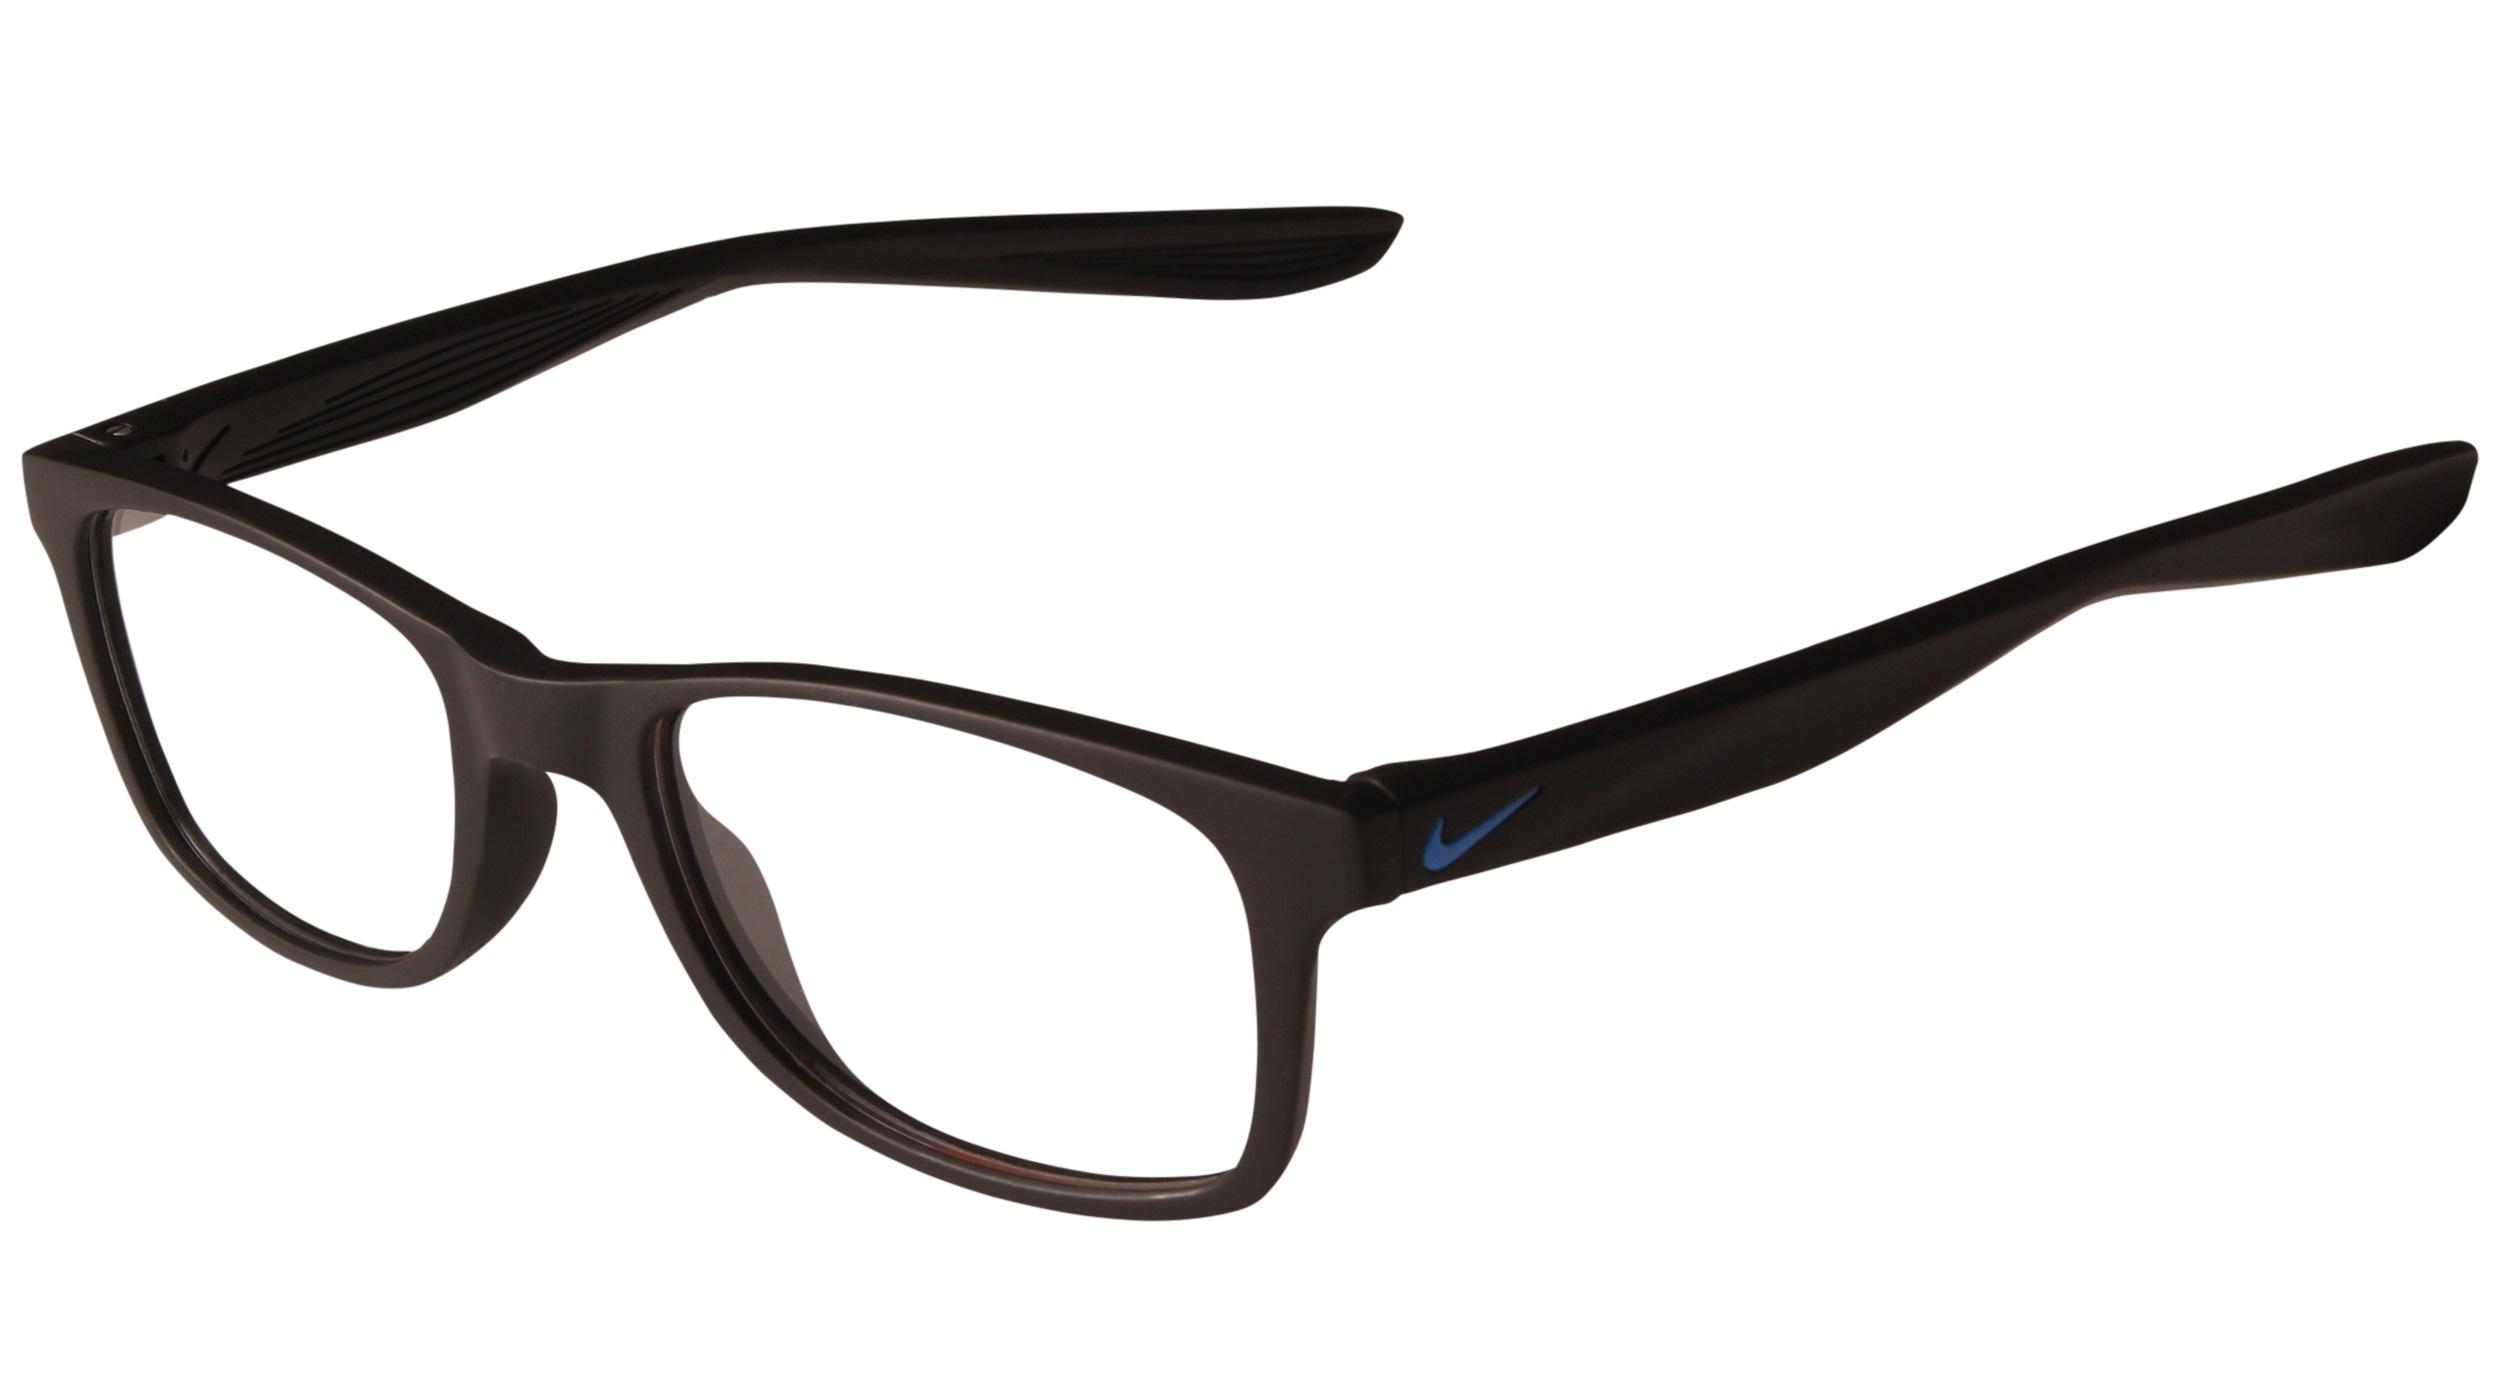 107dd052904 Nike 5004-001 Kids Eyeglasses Matte Black Nike5004-001 - Optiwow